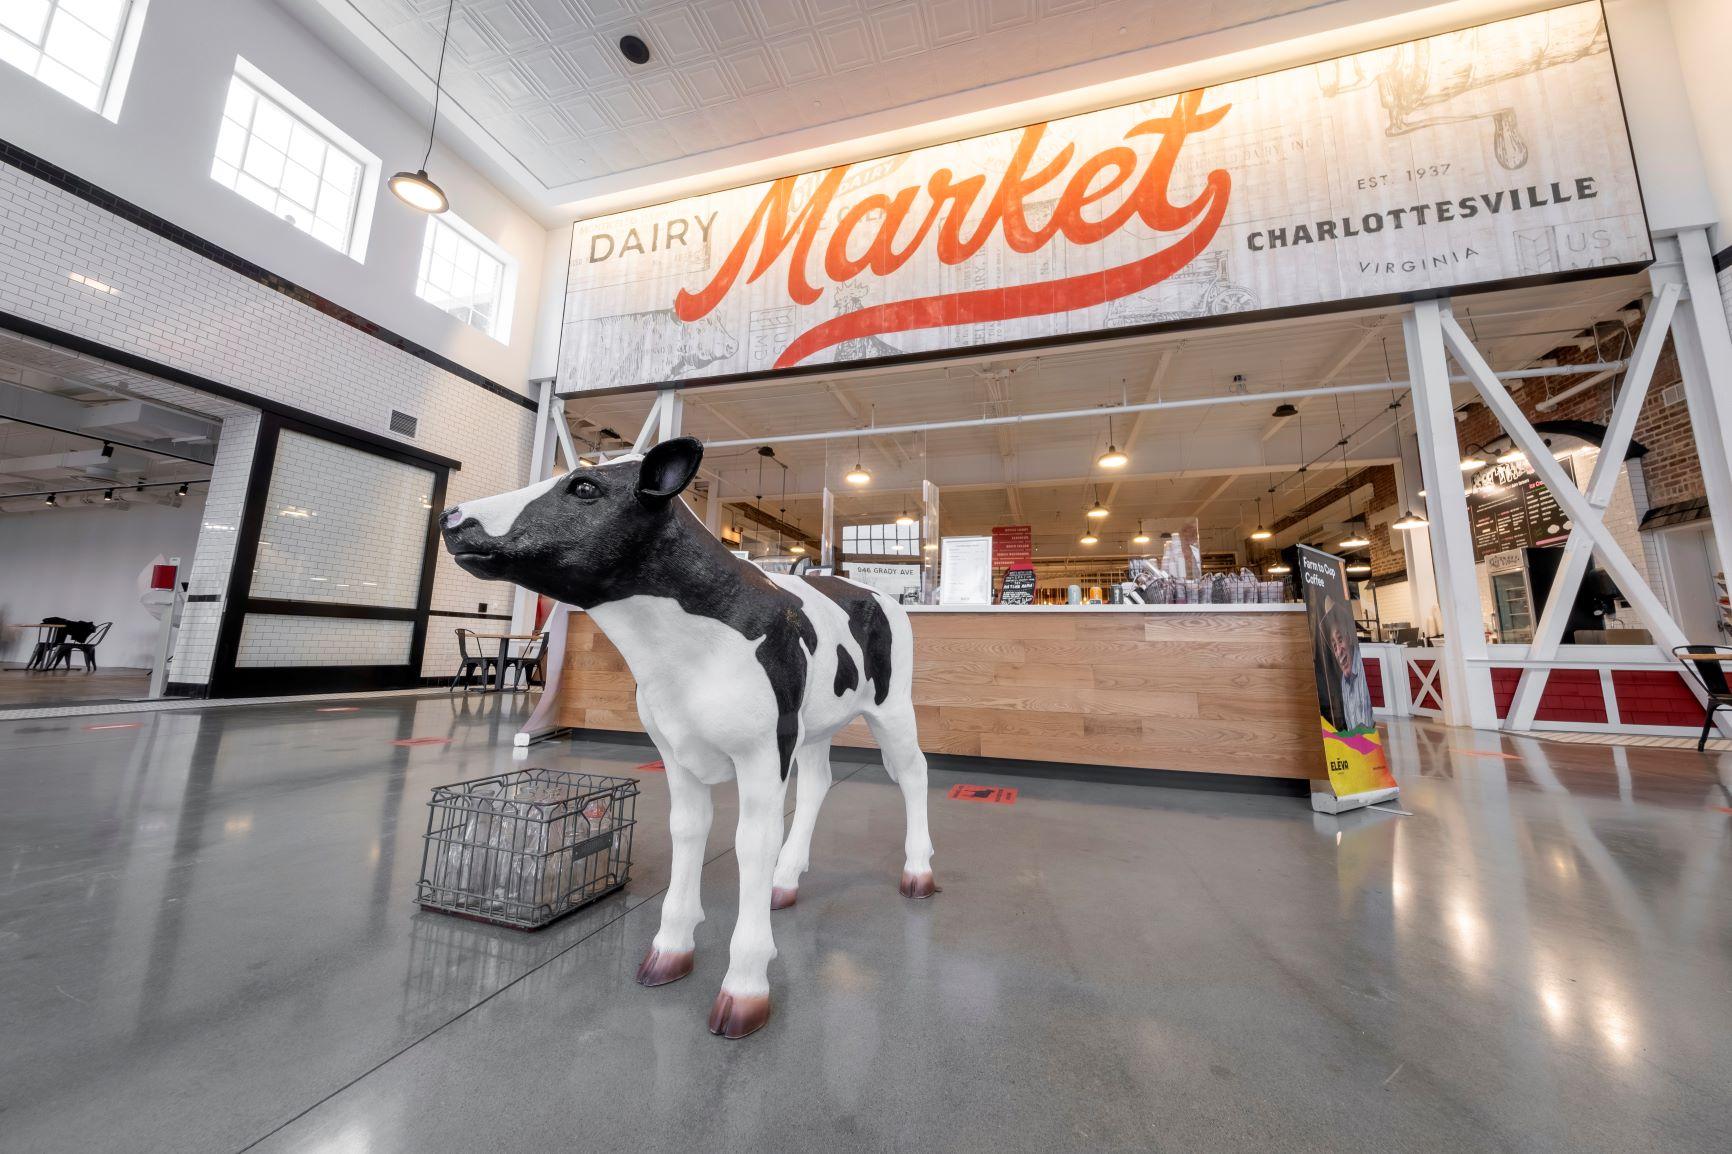 Pretend Cow in Dairy Market Entrance